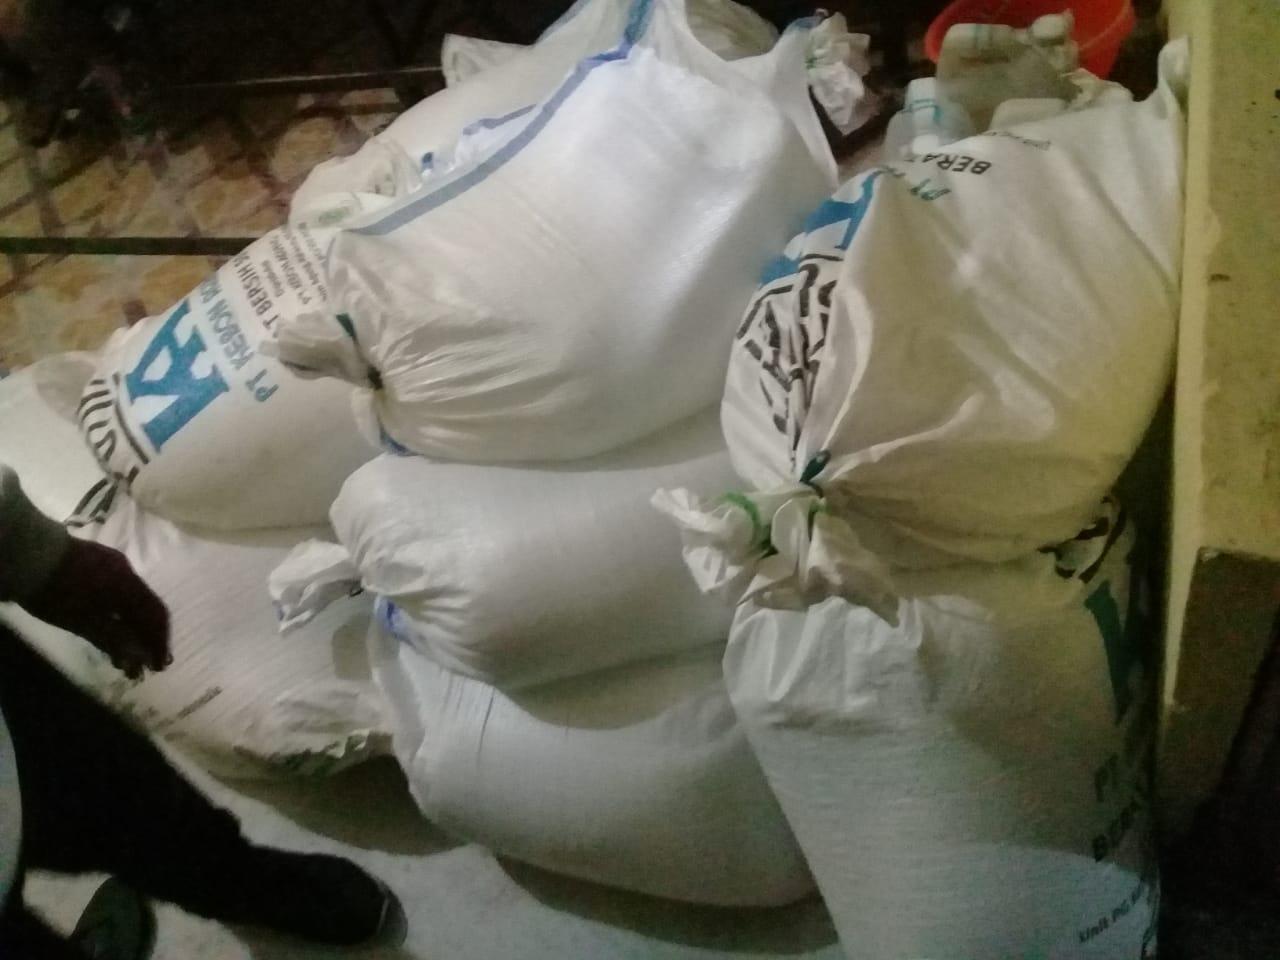 Polres Sumba Timur Gagalkan Pengiriman Ratusan Liter Pineraci ke Sumba Barat